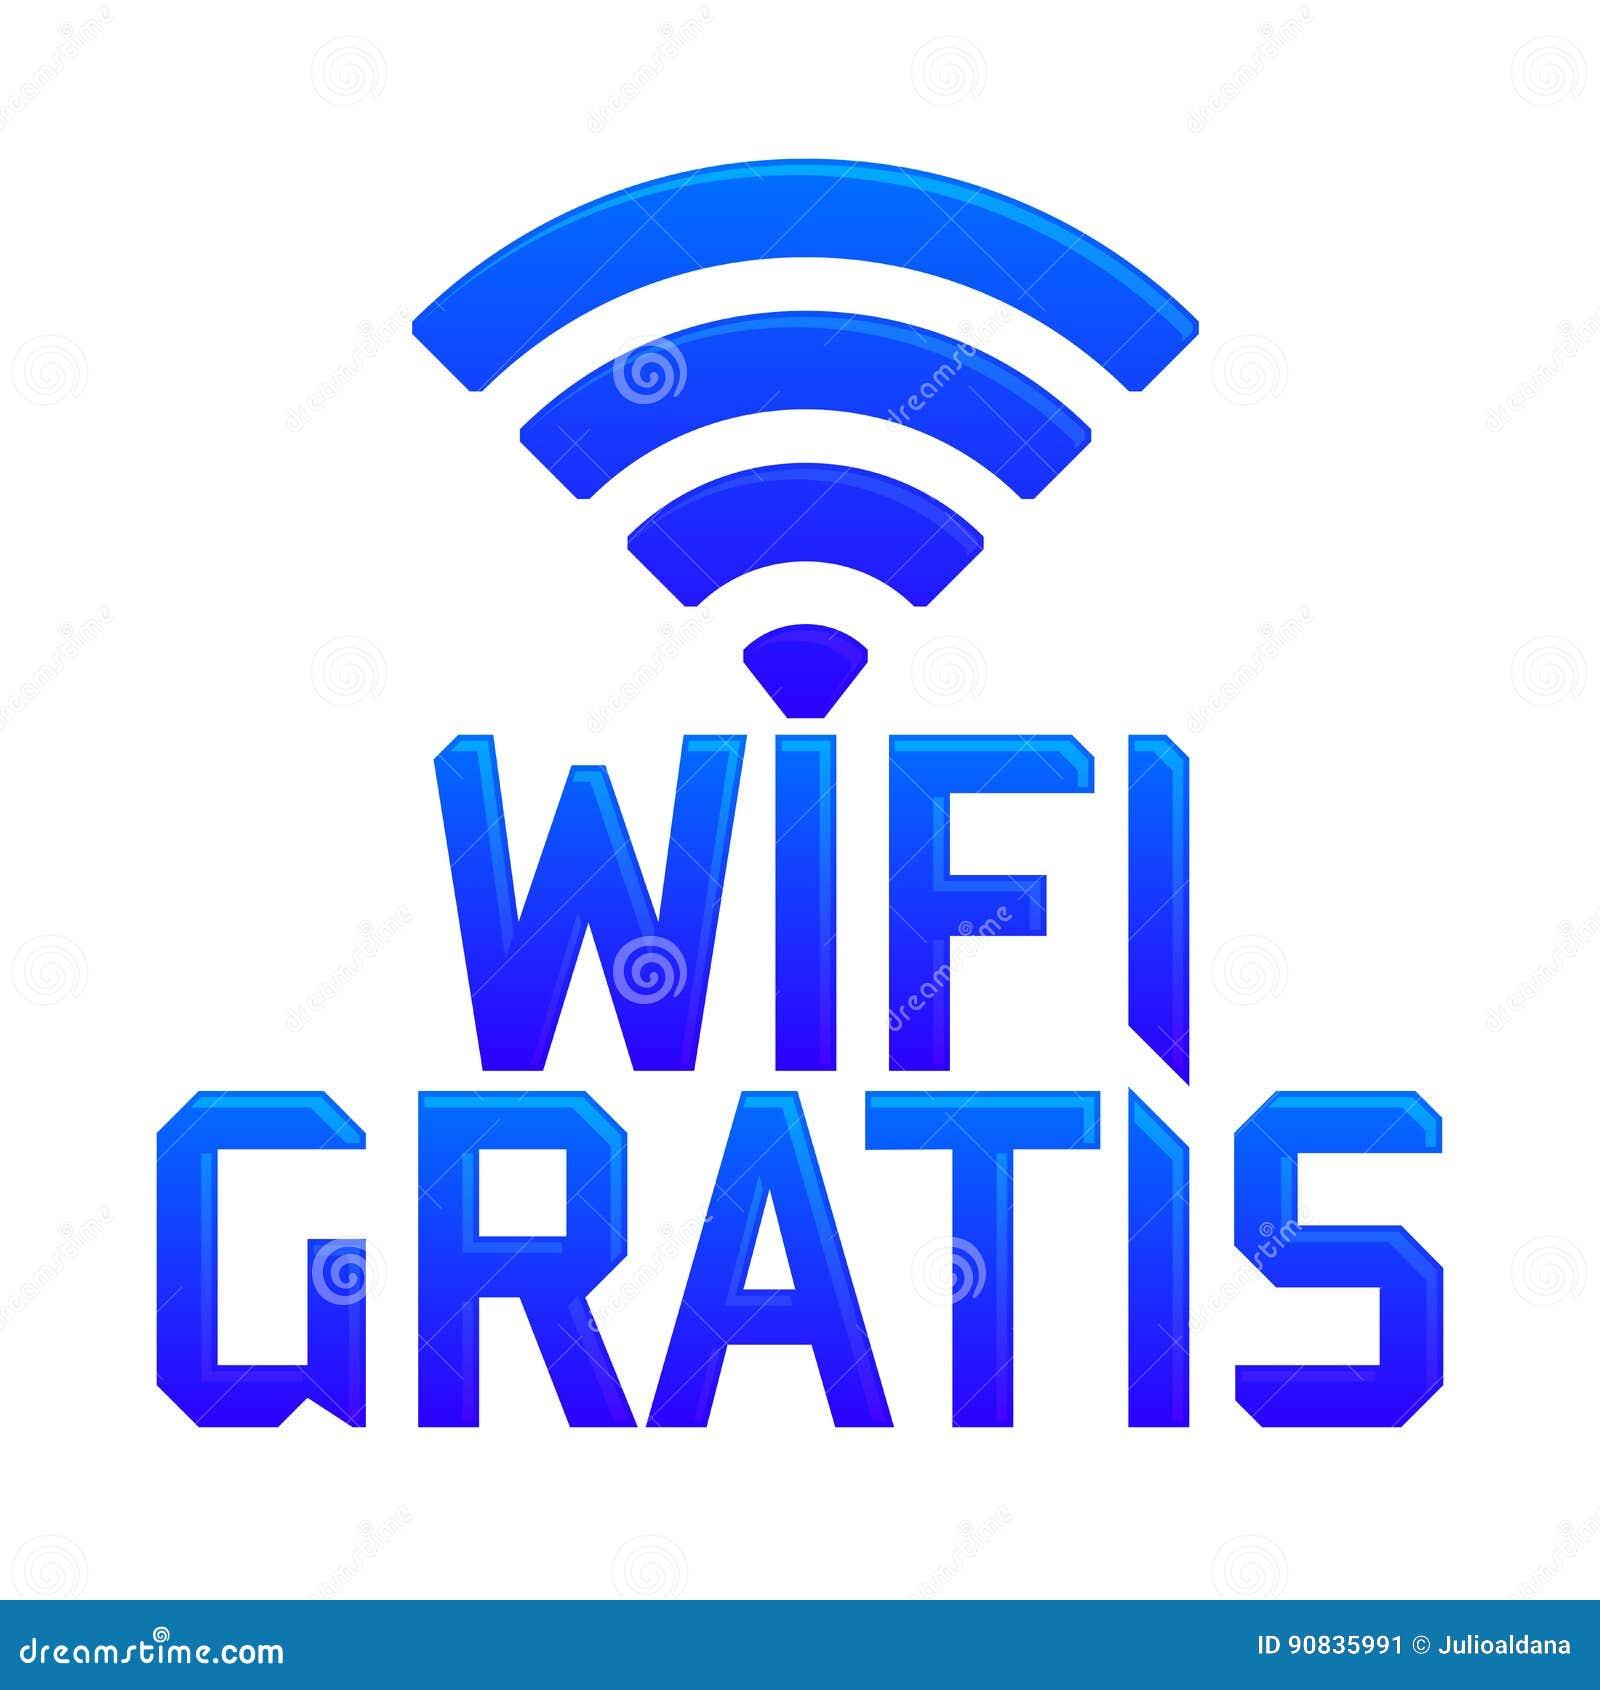 Wifi gratis, spanish translation: free wifi, vector zone sign icon.